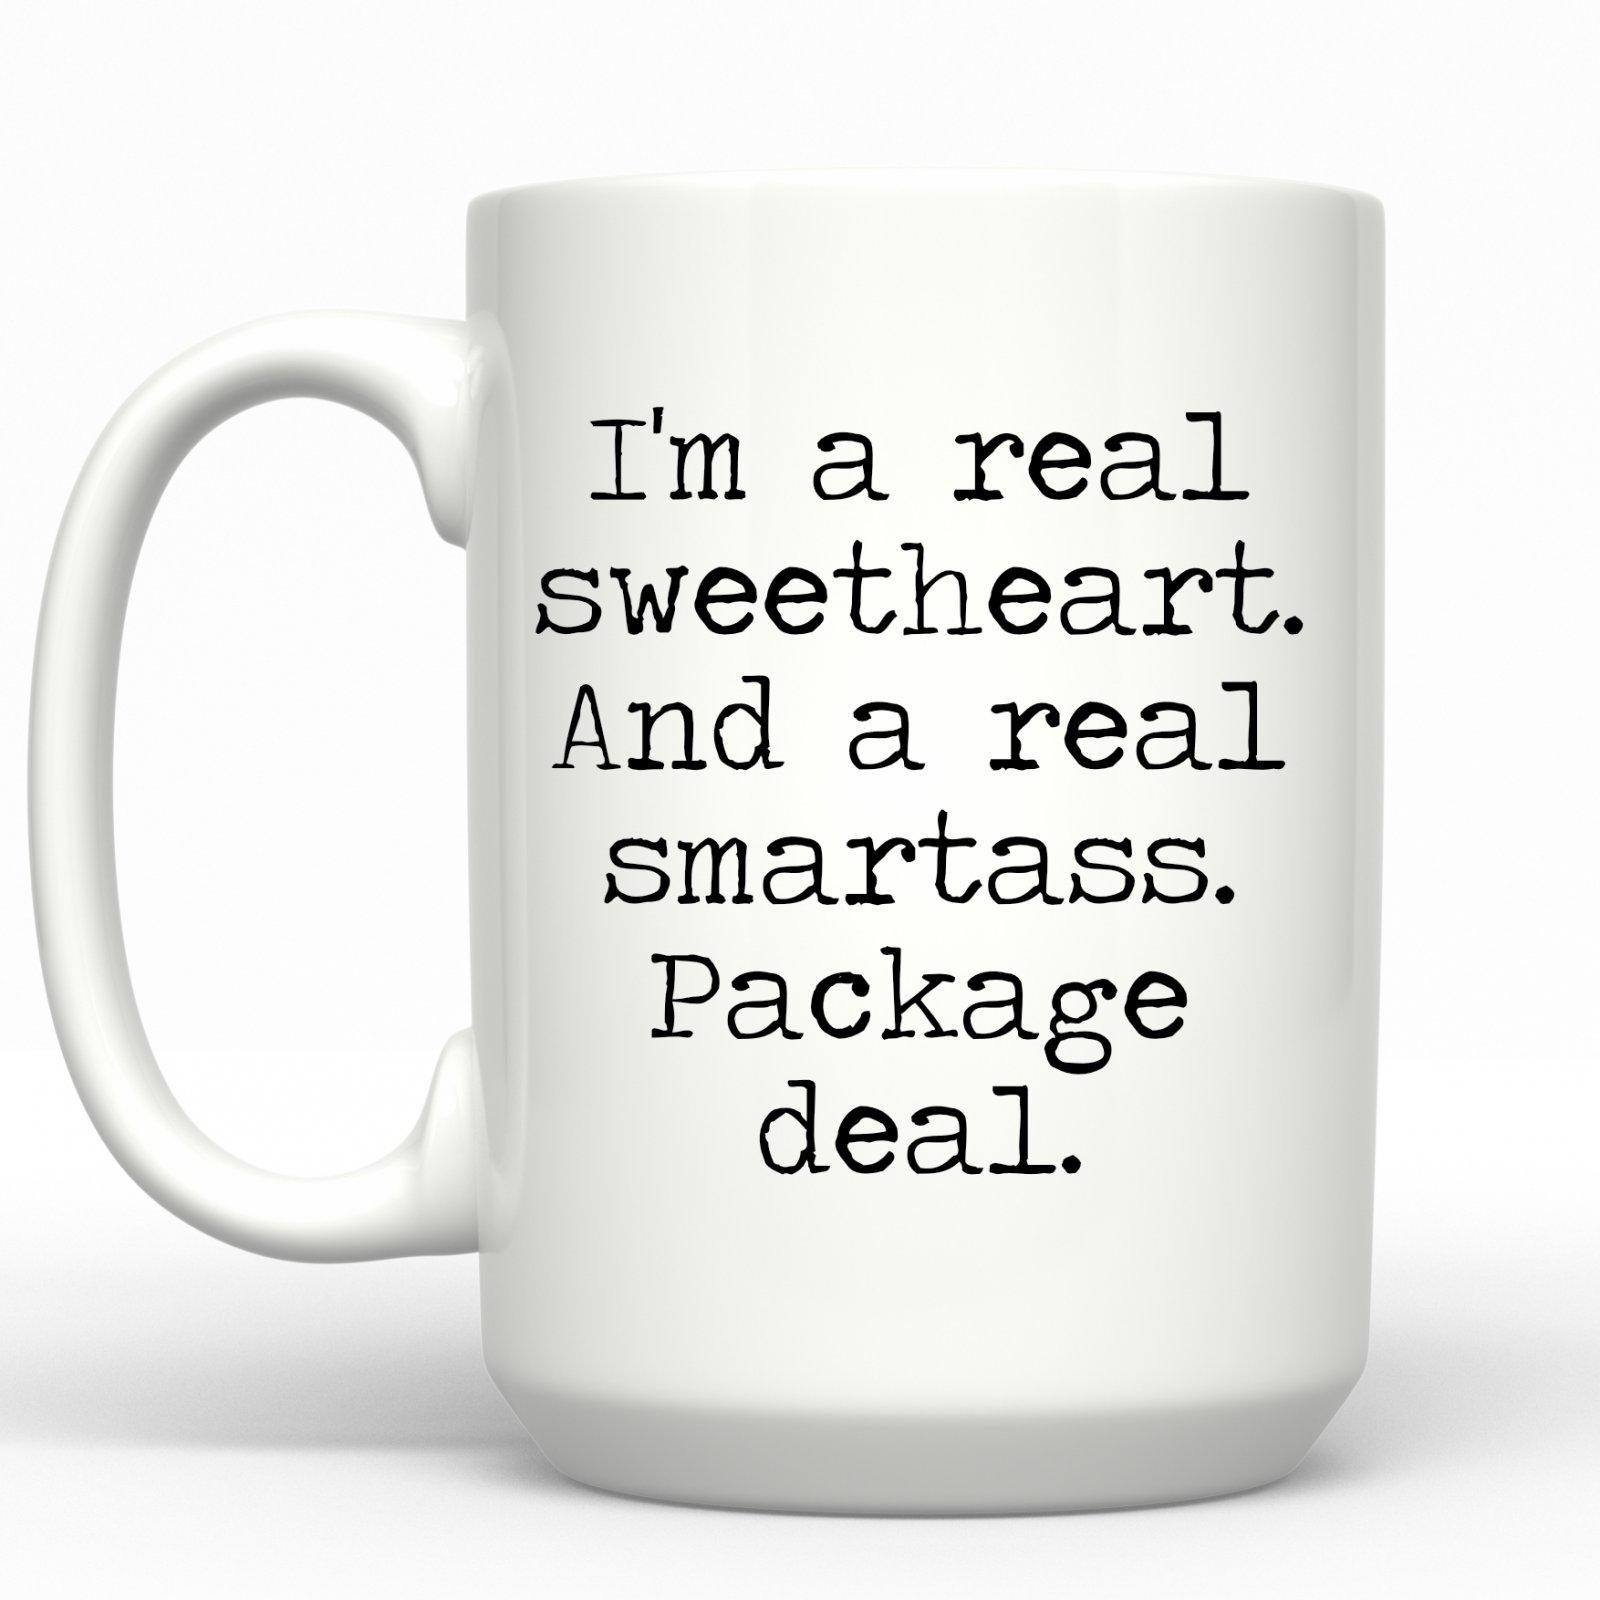 I'm a real Sweetheart Mug